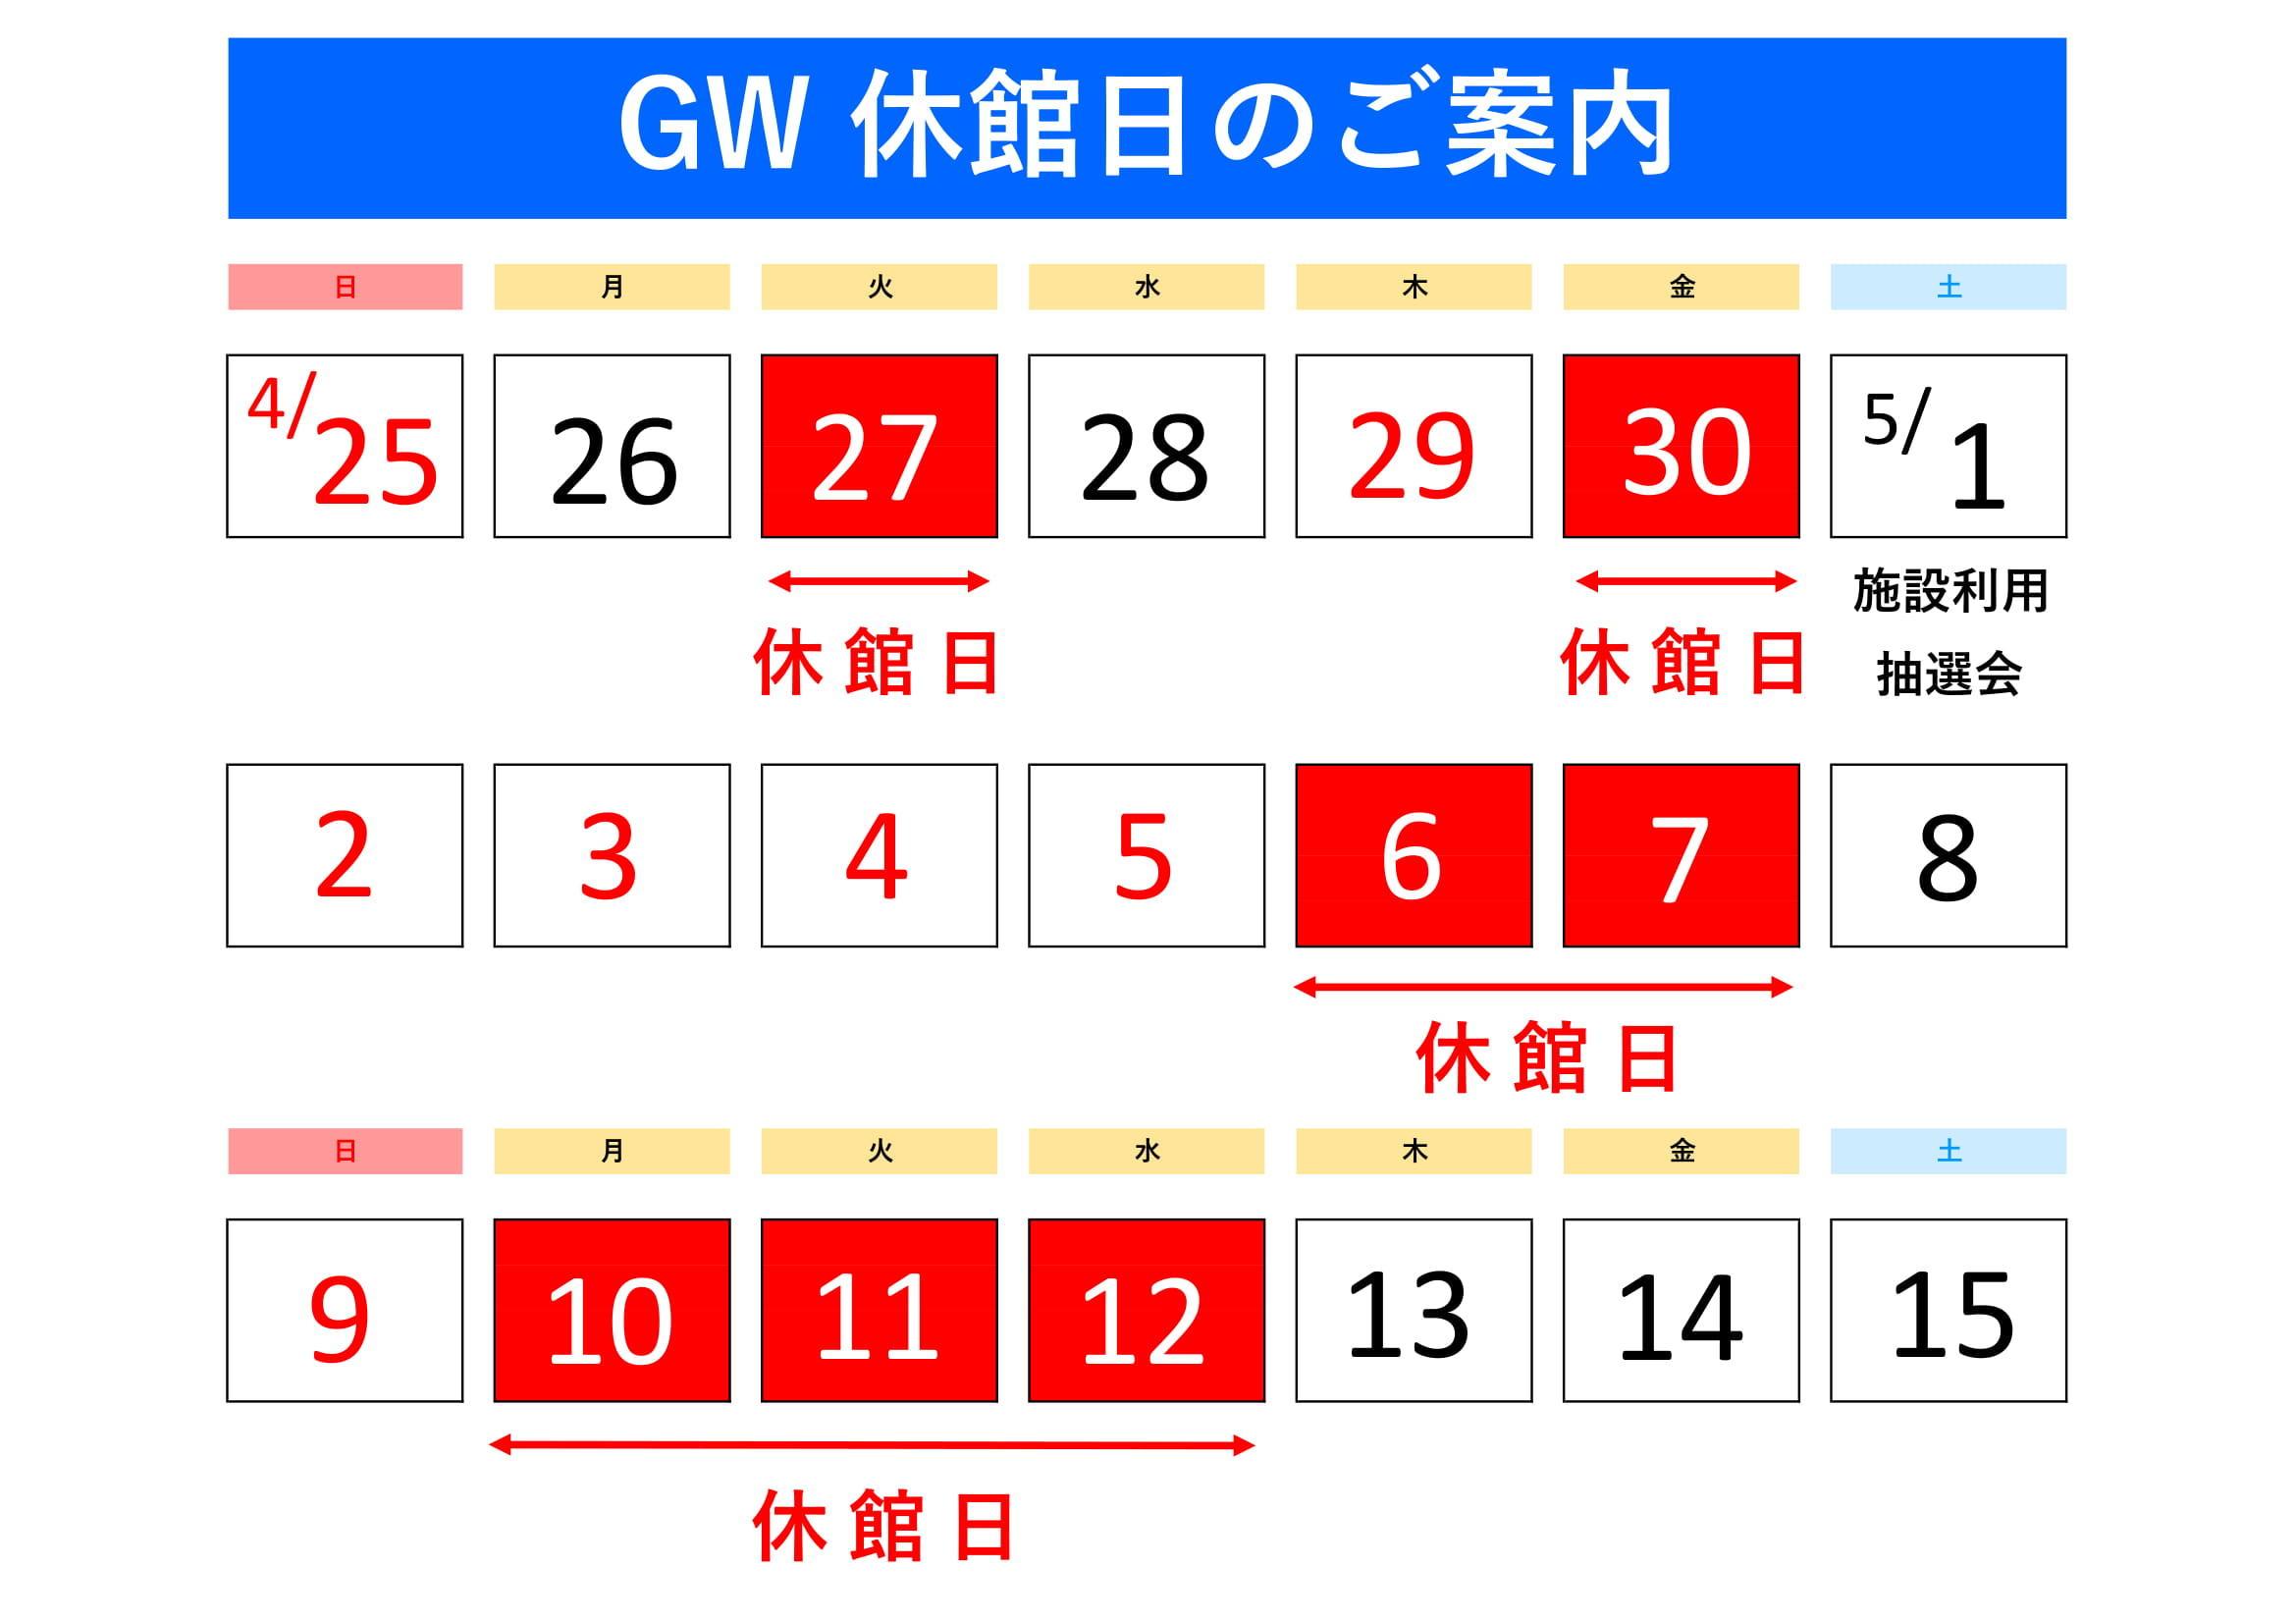 https://atsugi-bunka.jp/topics/img/21c92d7c5ae0917cebc0a799f210f5d68bccb36e.jpg